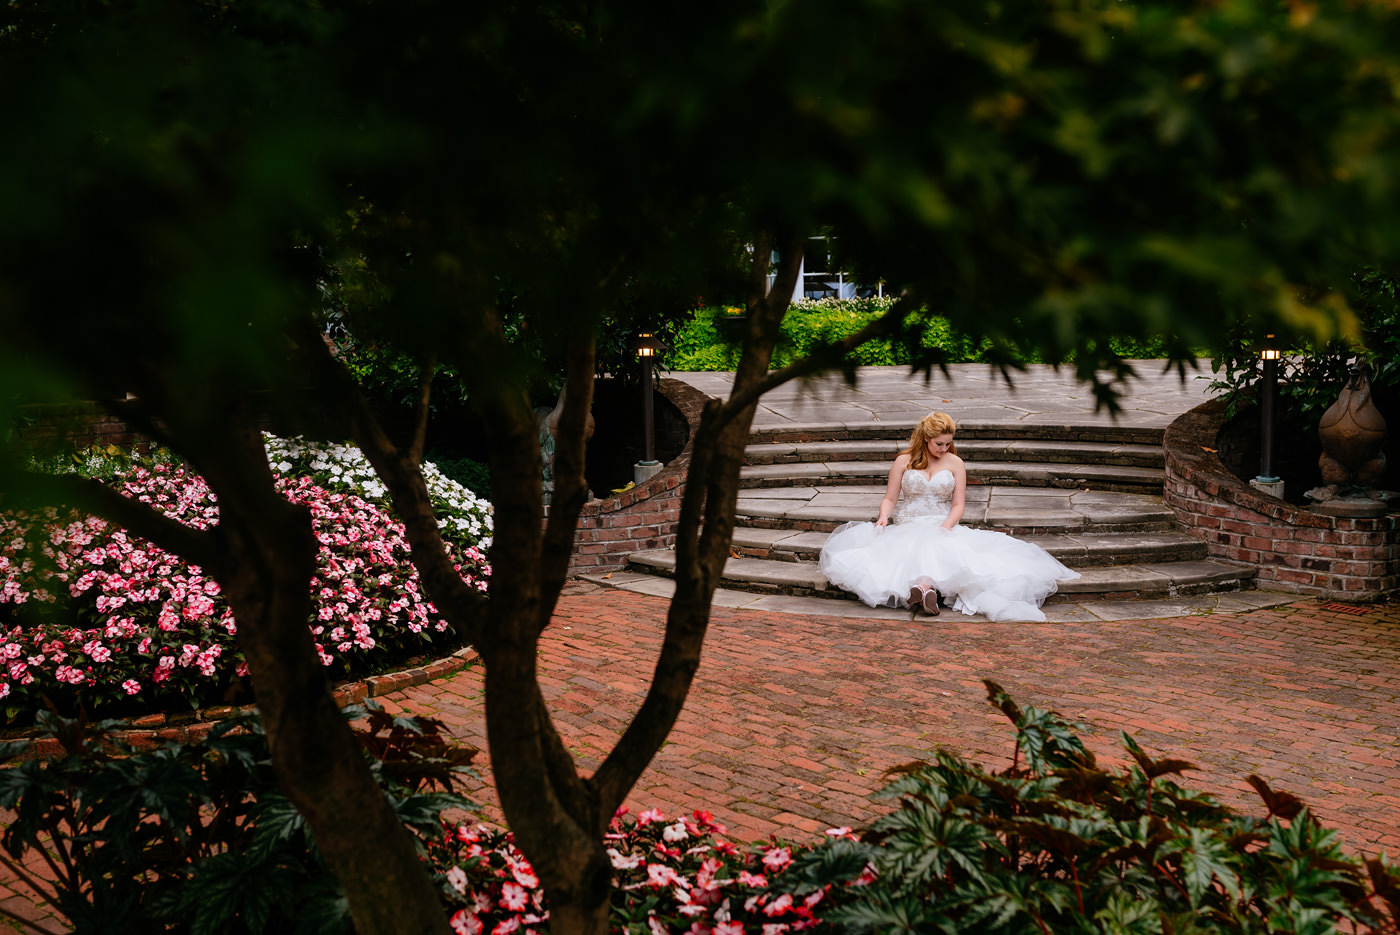 greenbrier resort garden bridal photos